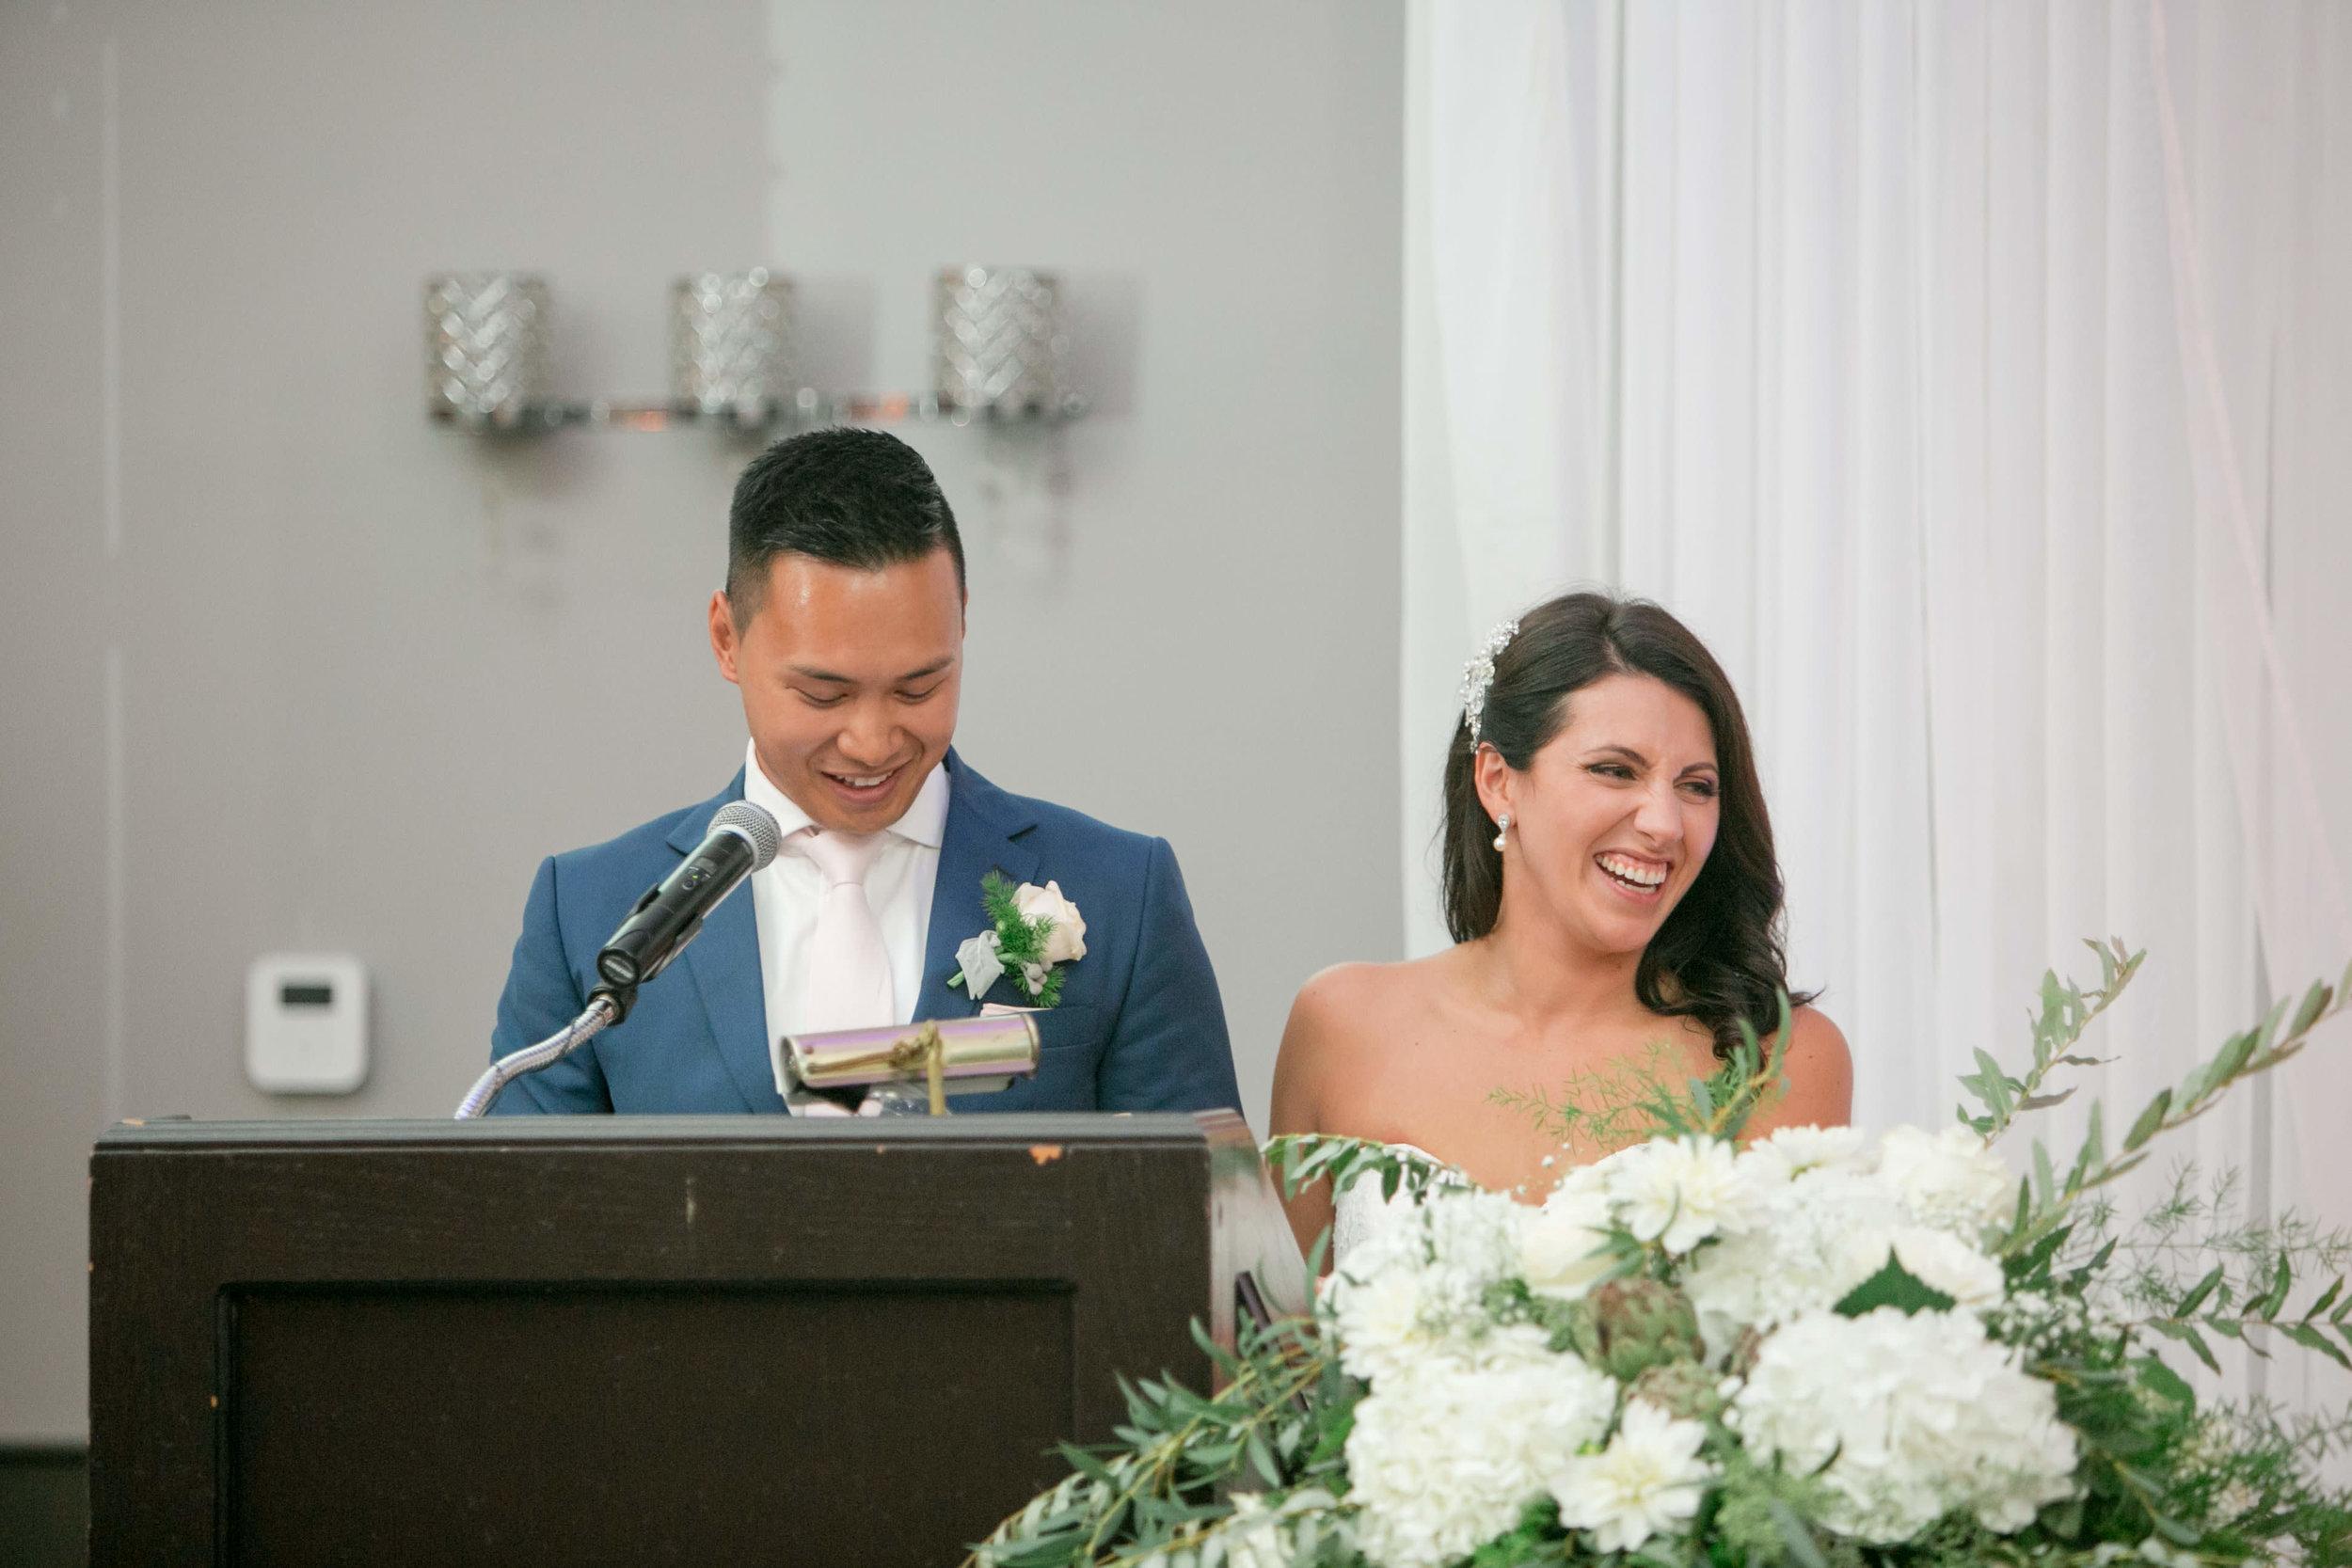 Stefanie___Bernard___Daniel_Ricci_Weddings_High_Res._Finals__662.jpg